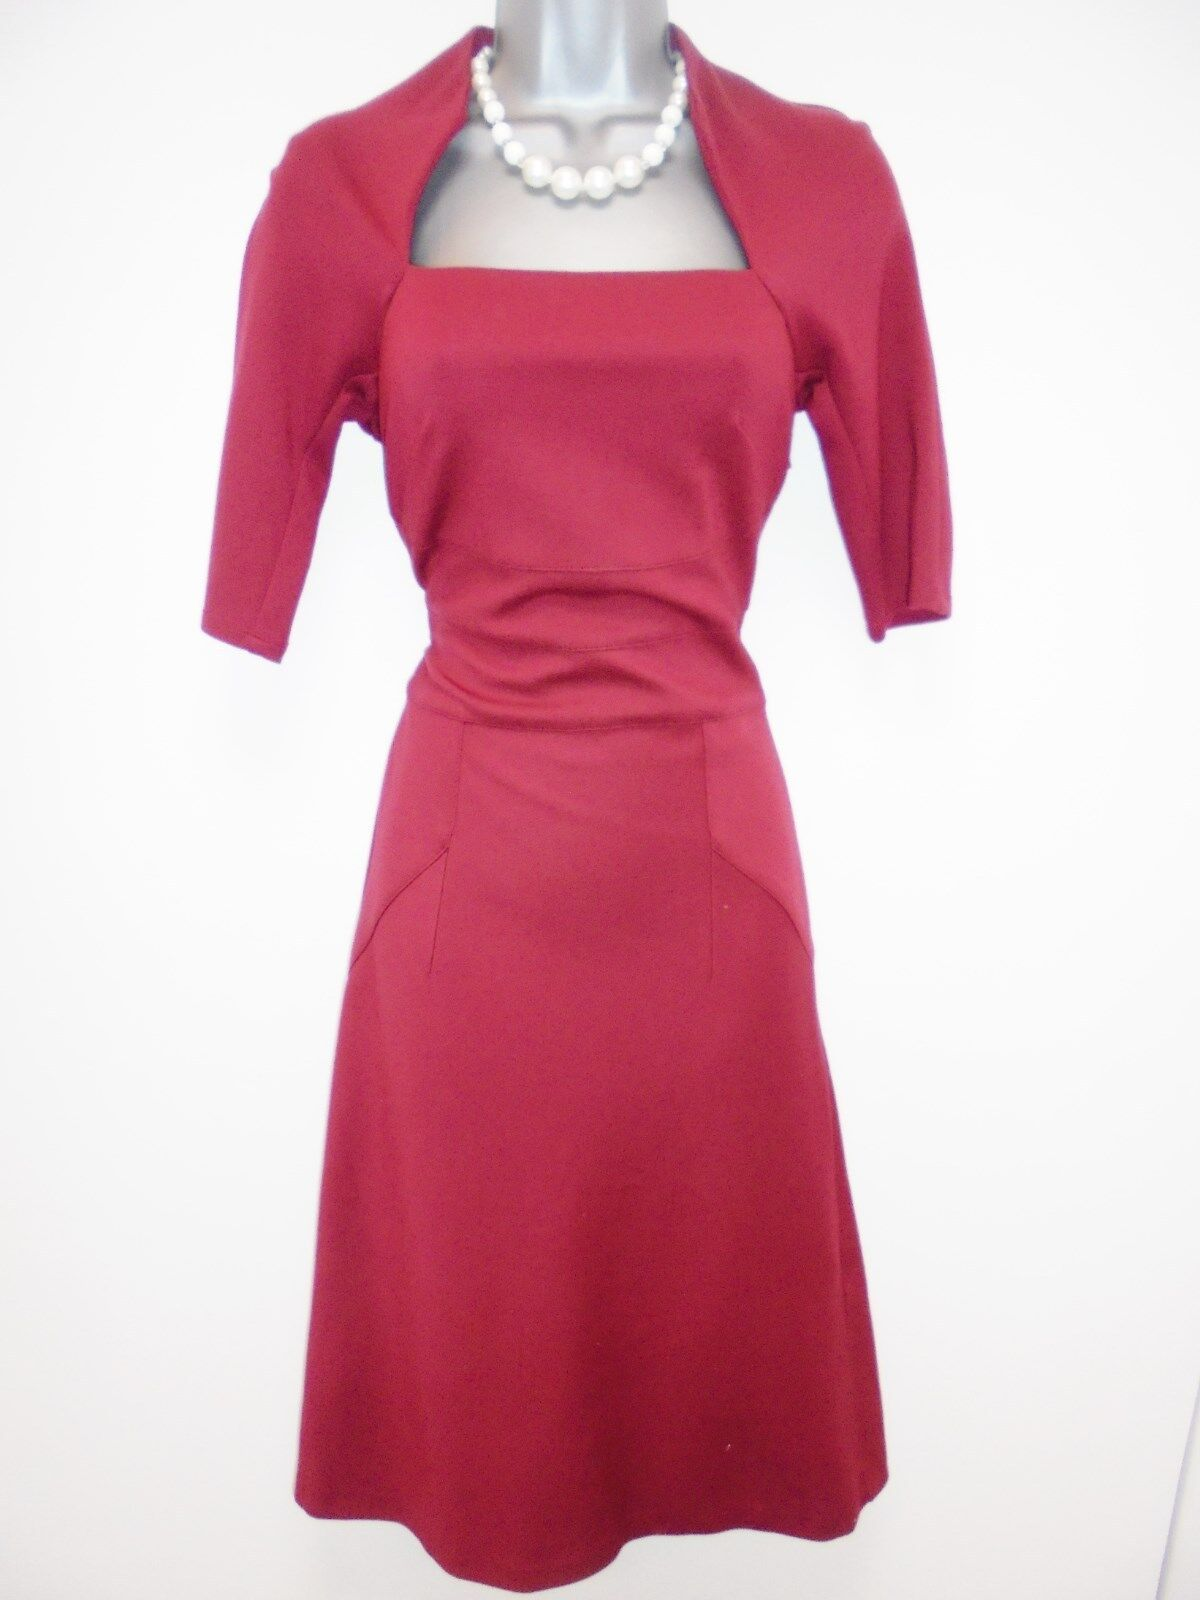 Stunning Mary Portas Maroon Galaxy Wiggle Stretch Evening Midi Day Dress Größe 8 | Vielfalt  | Ausgang  | Zart